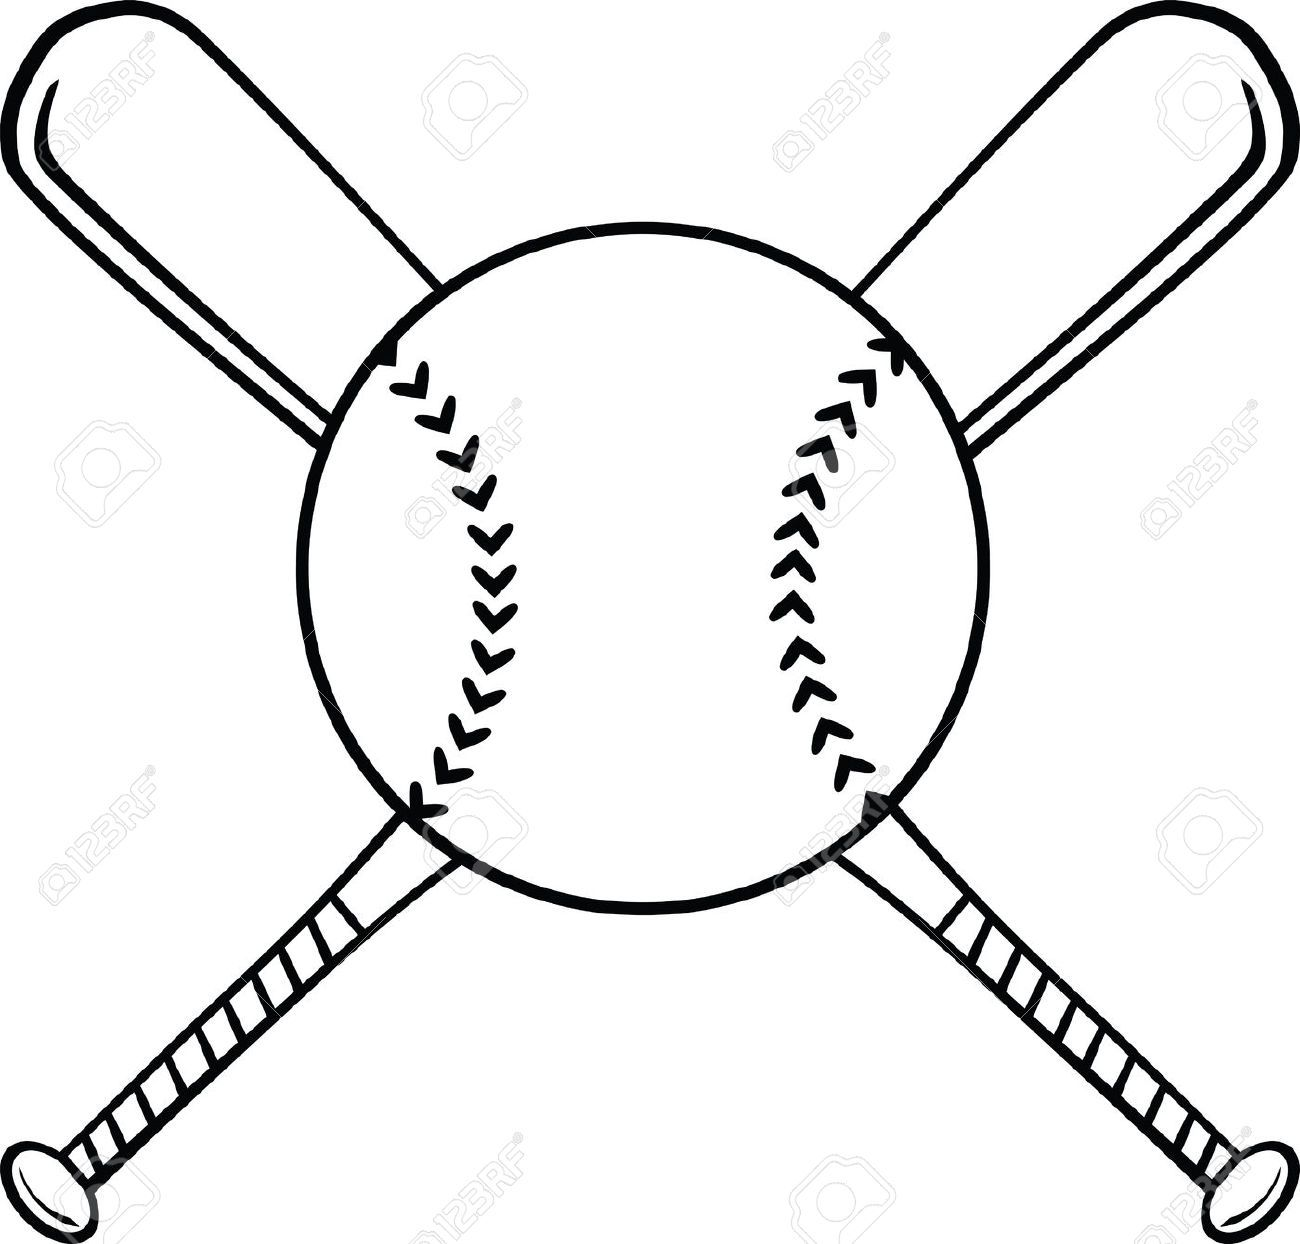 Softball clipart draw. Ball and bat clipartfox